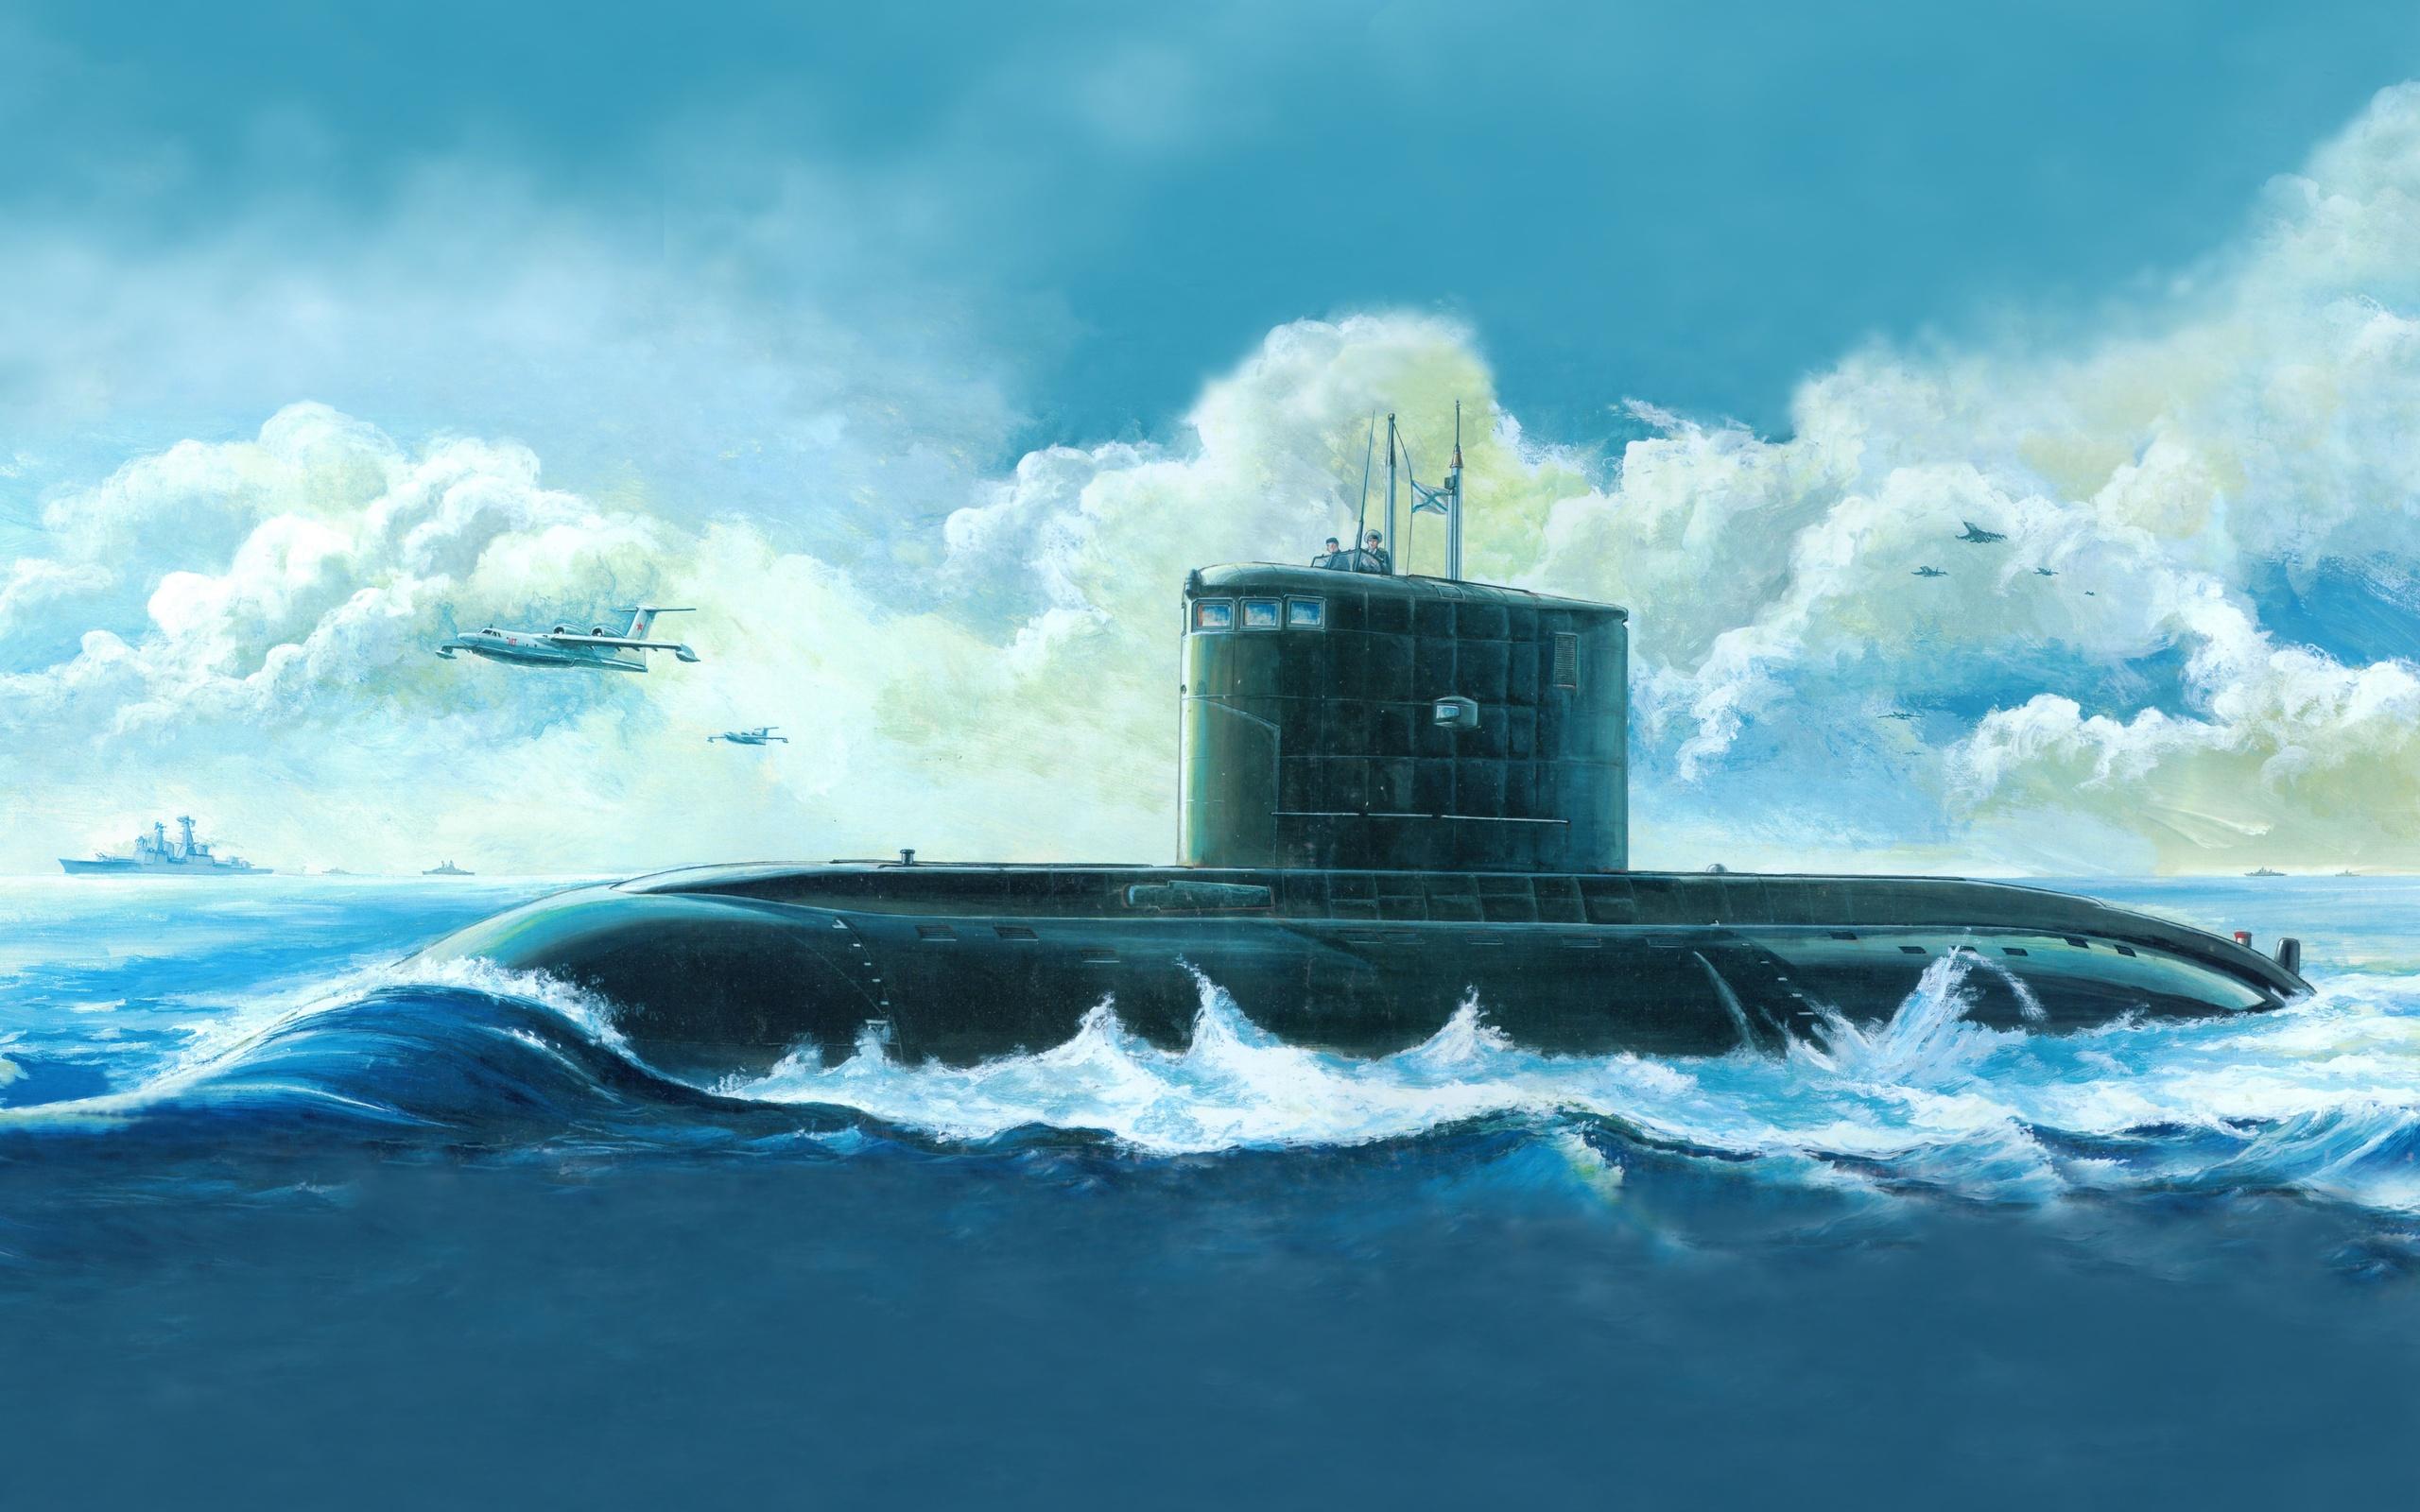 Submarine Computer Wallpapers Desktop Backgrounds 2560x1600 ID 2560x1600